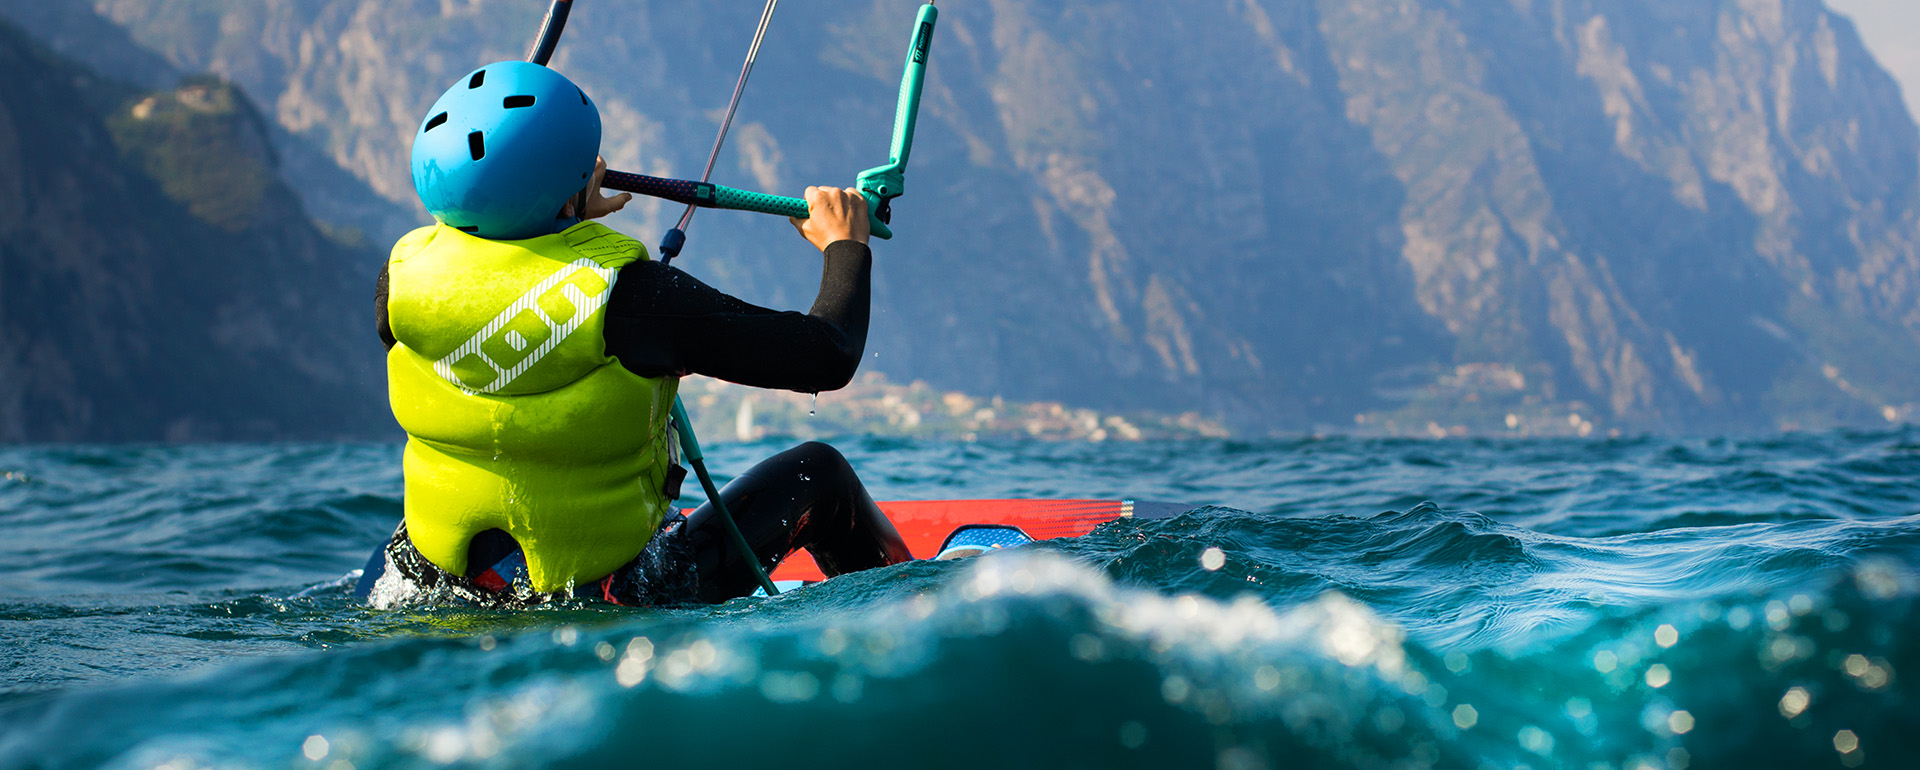 Kiteschule Gardasee